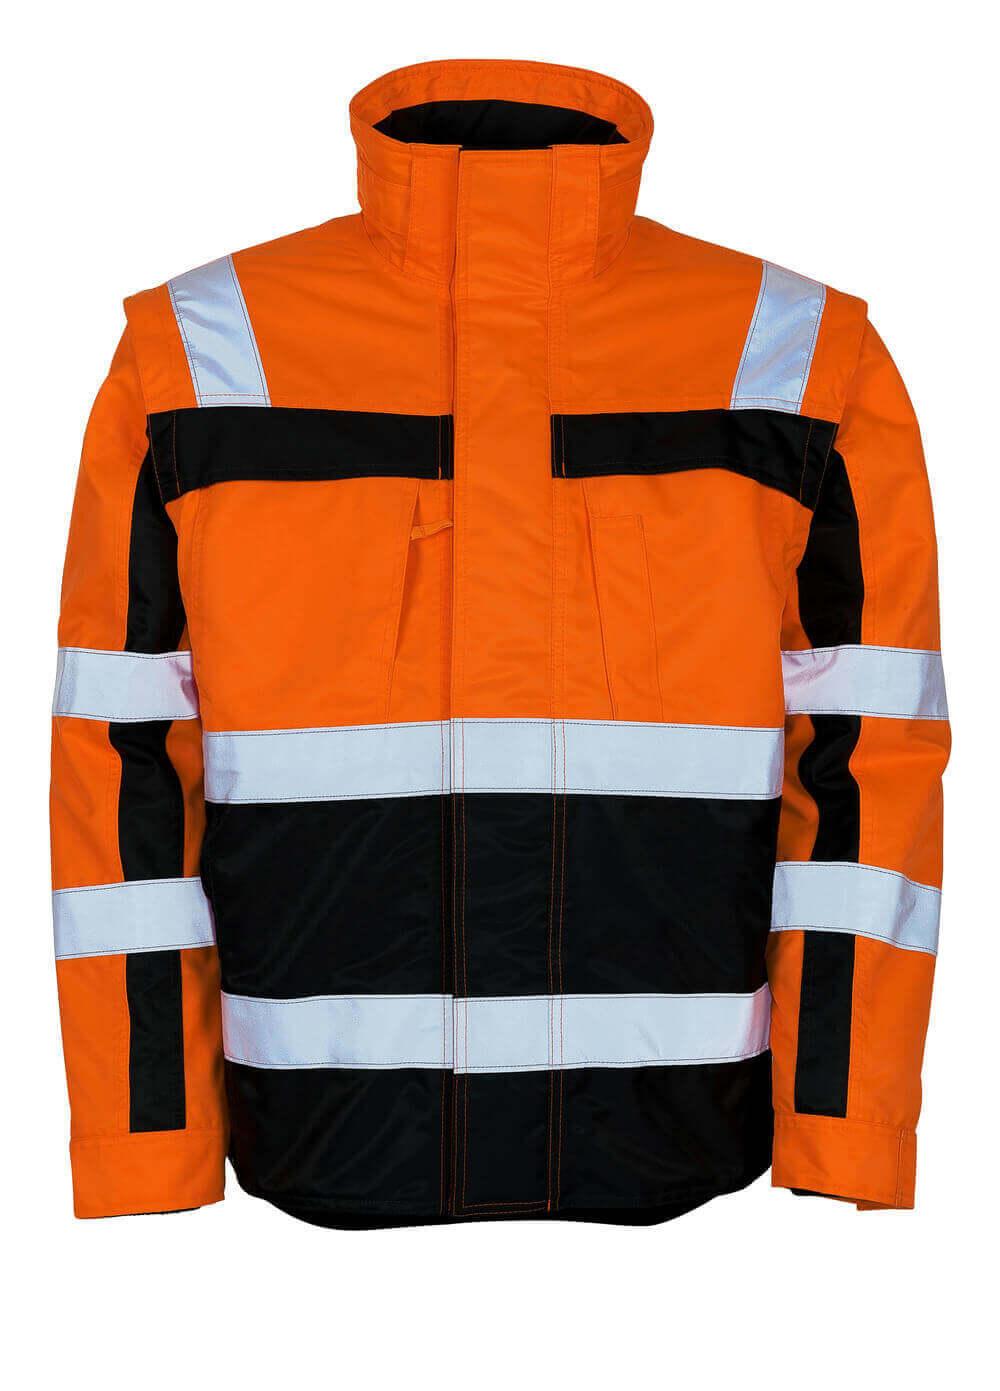 09335-880-141 Veste grand froid - Hi-vis orange/Marine